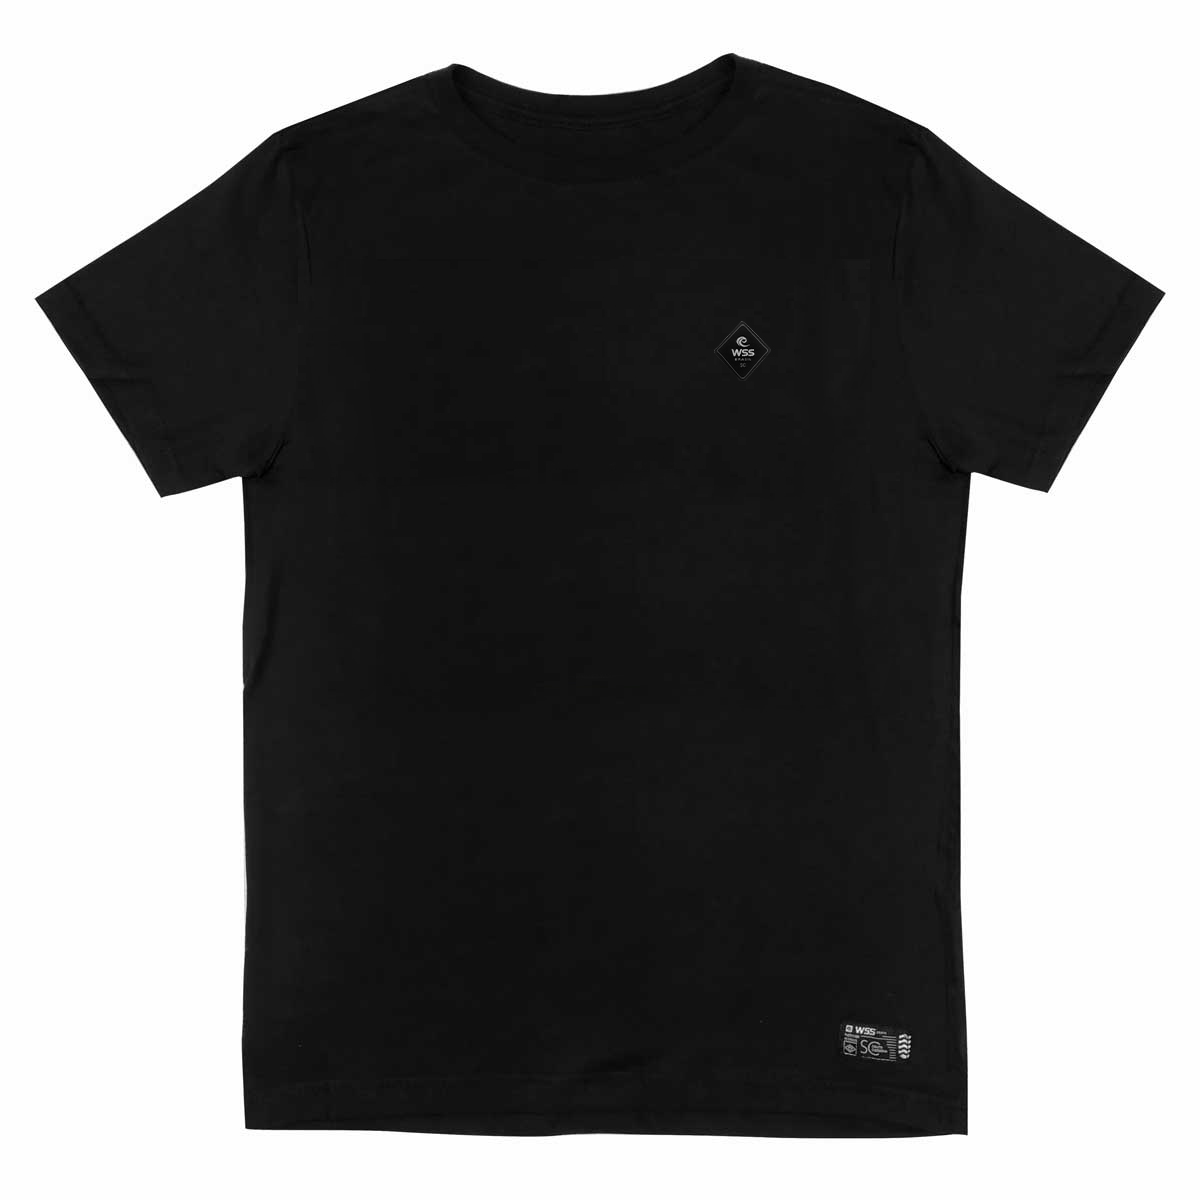 Camiseta Masculina Prime WSS Diamond Black